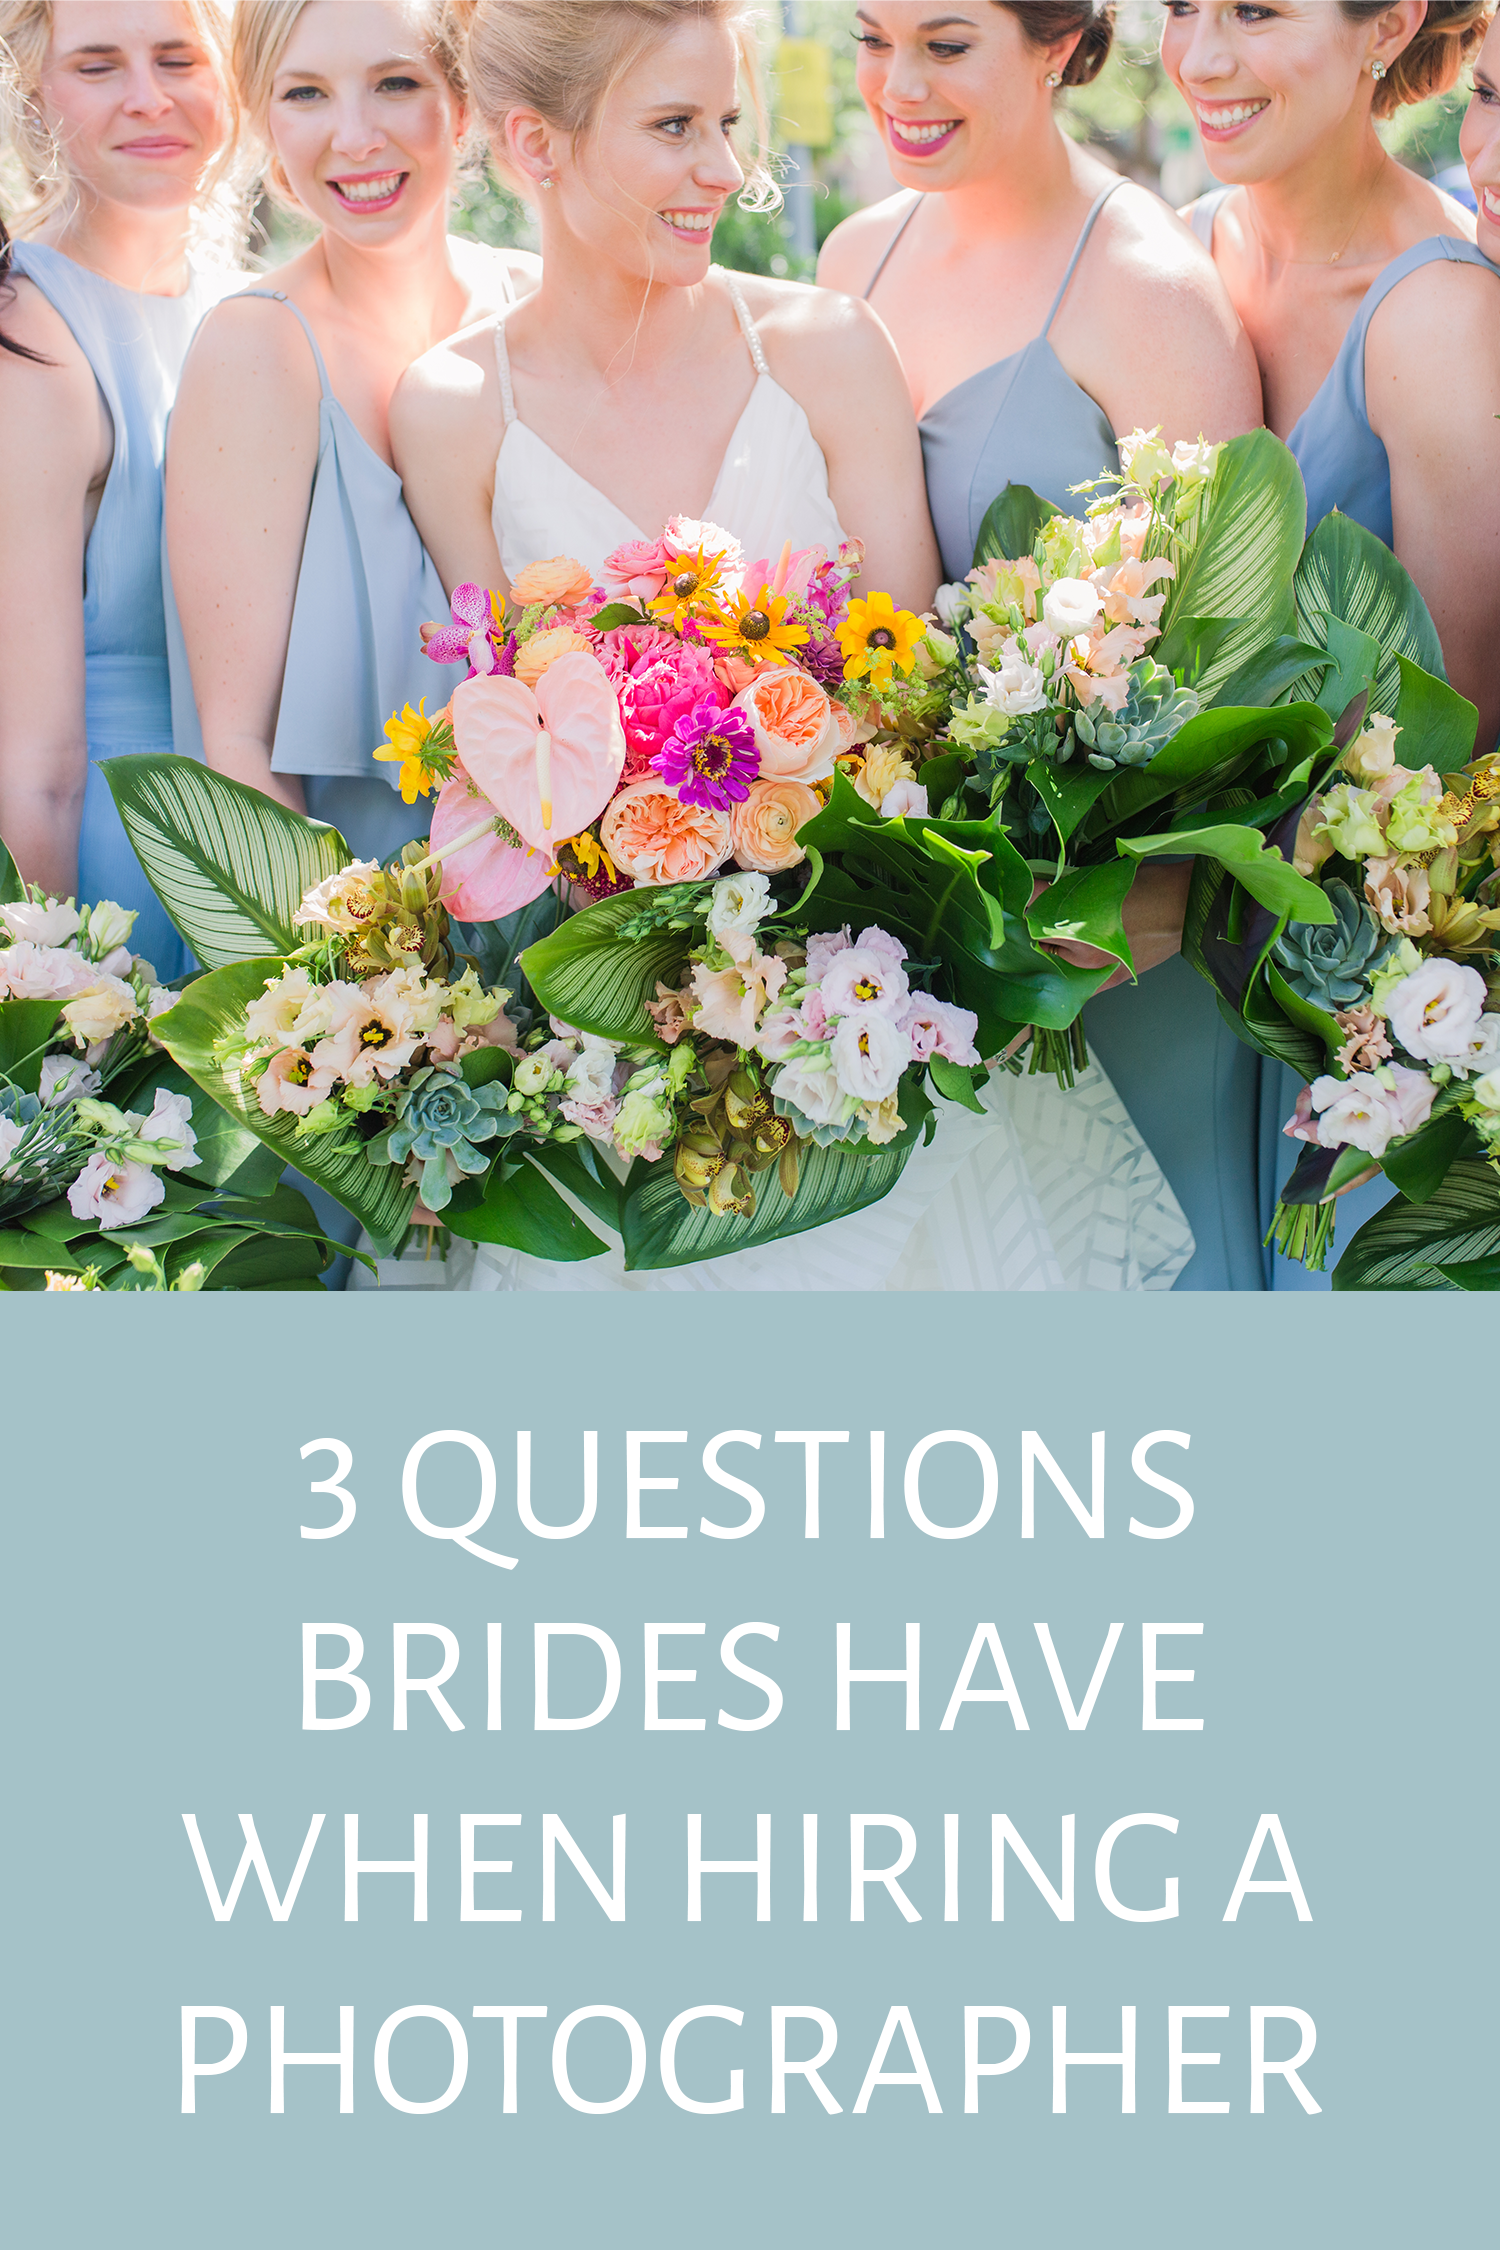 3 Questions Brides Have When Hiring a Photographer Bride